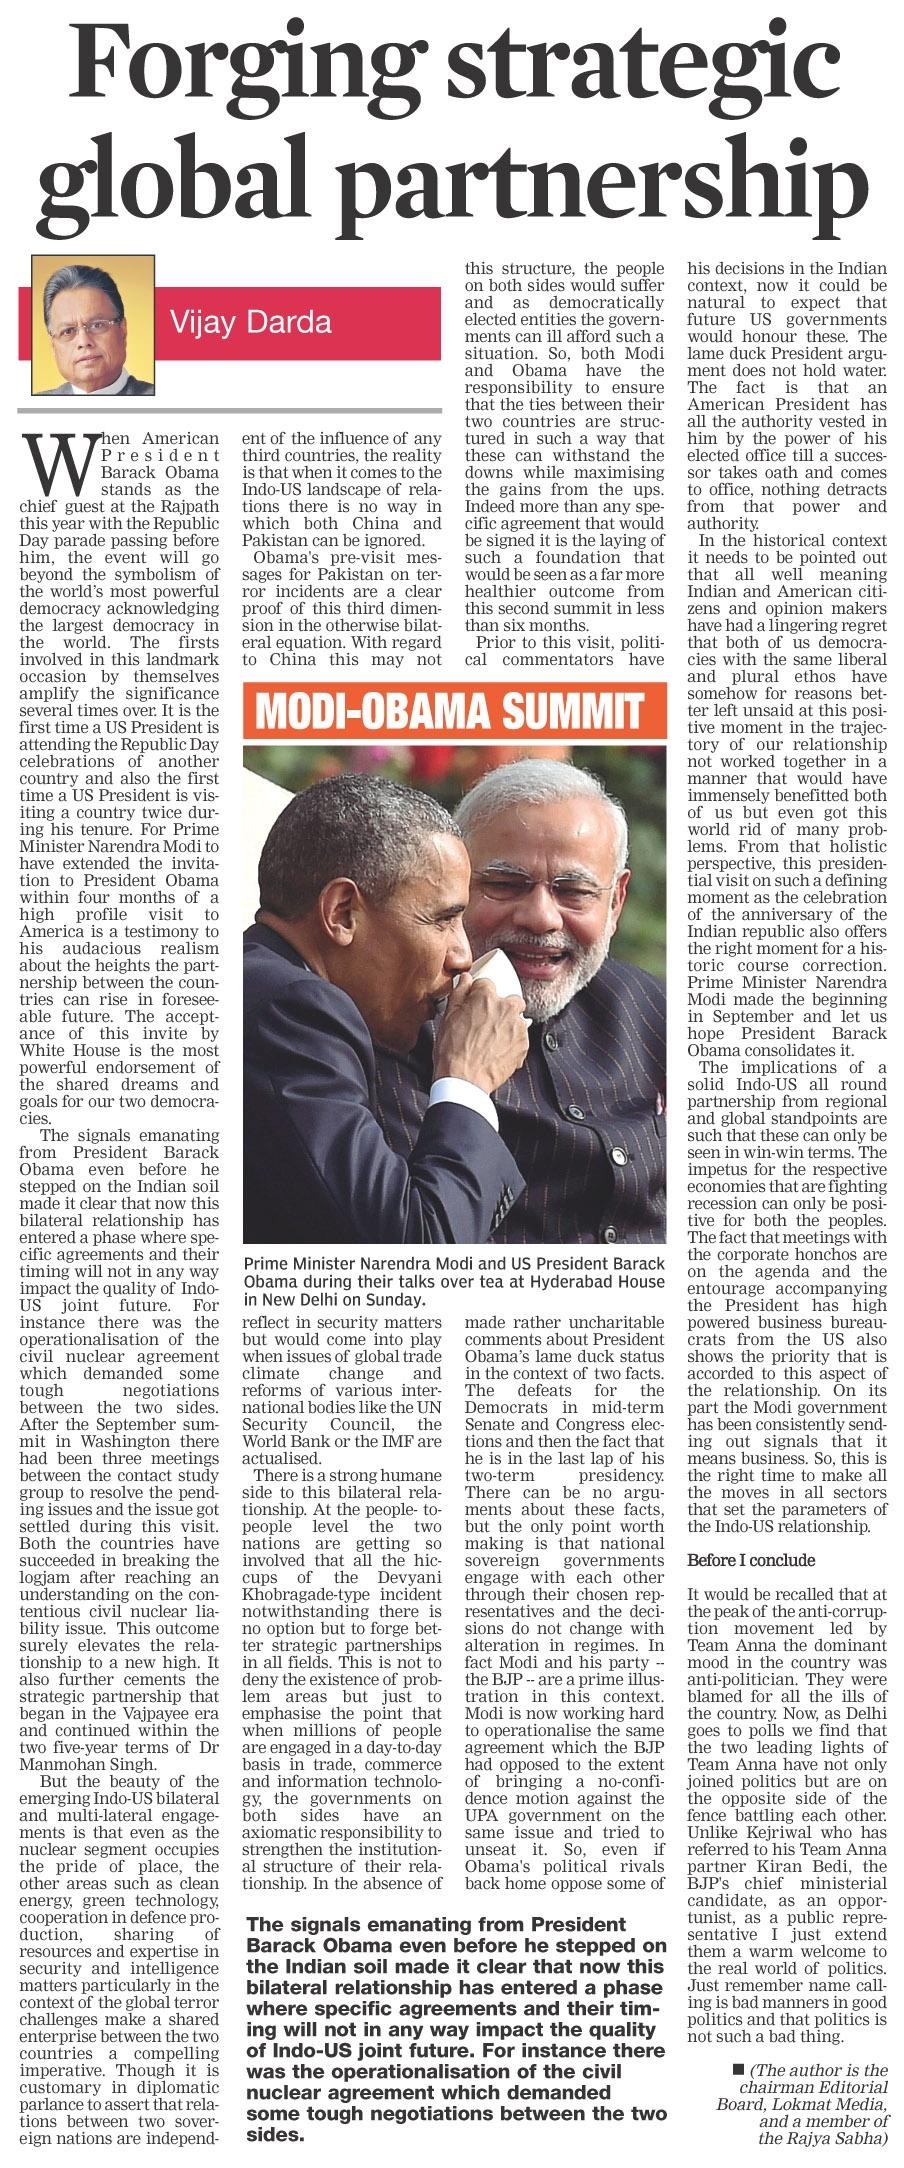 Forging strategic global partnership